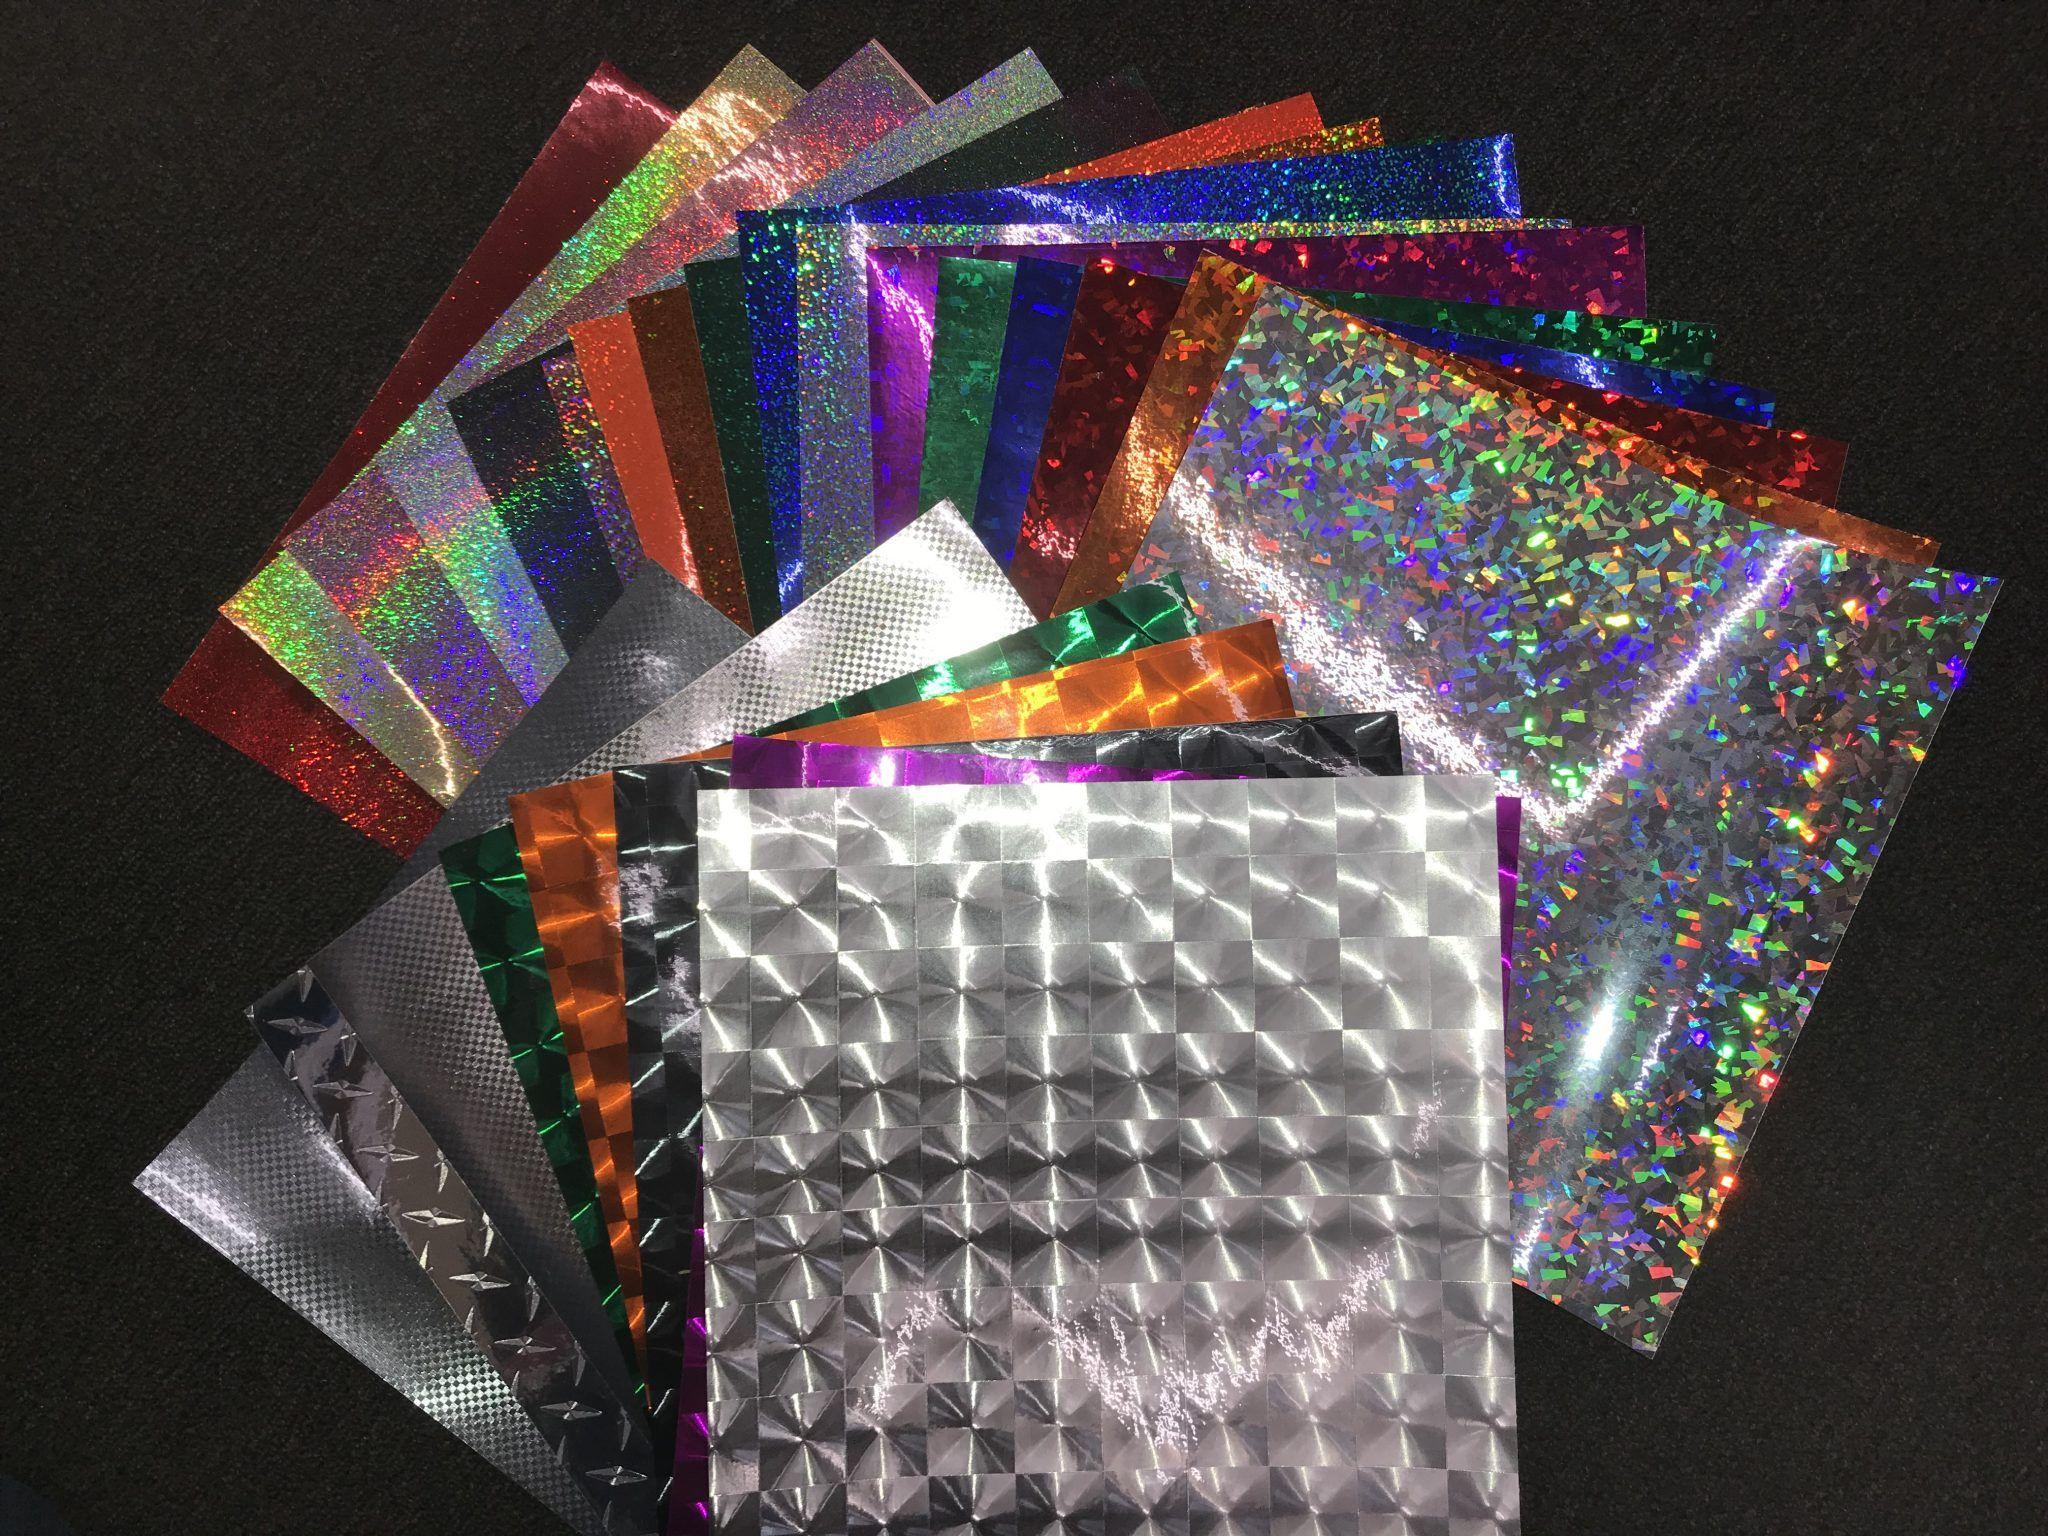 Vw Fantay Films Adhesive Vinyl Mi Vinyl World Adhesive Vinyl Diamond Plate Vinyl